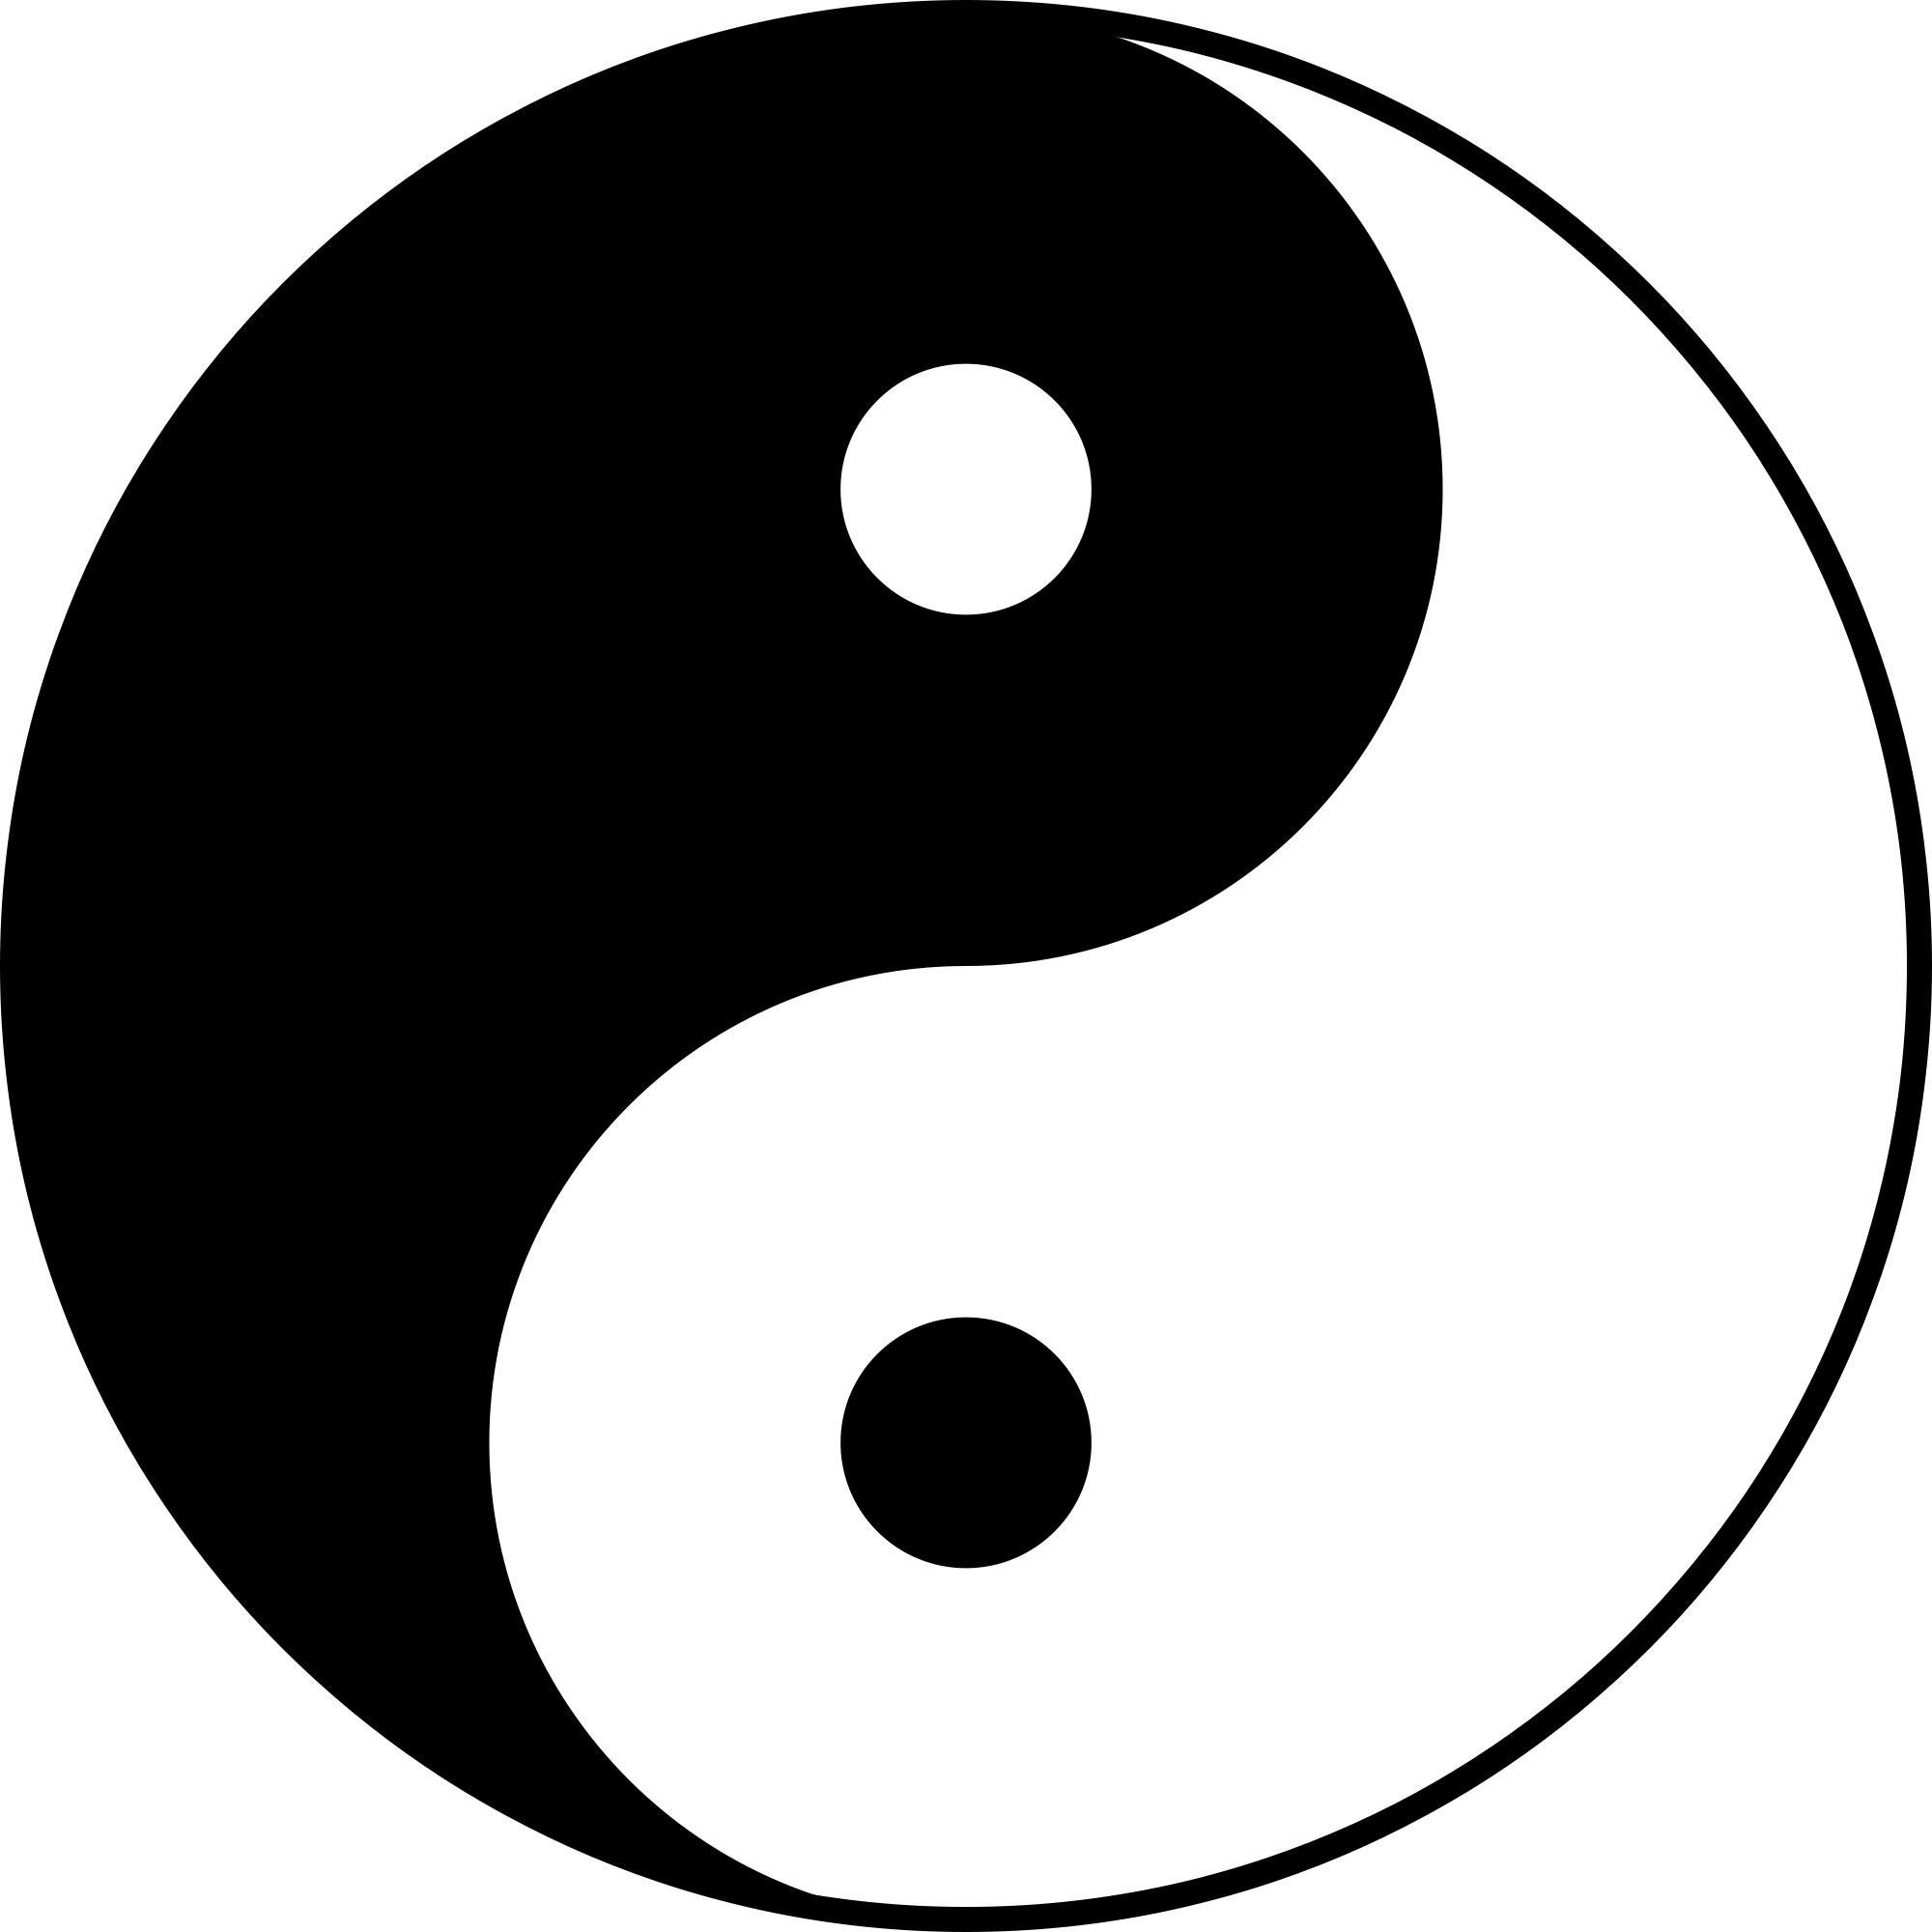 Significado de Yin Yang